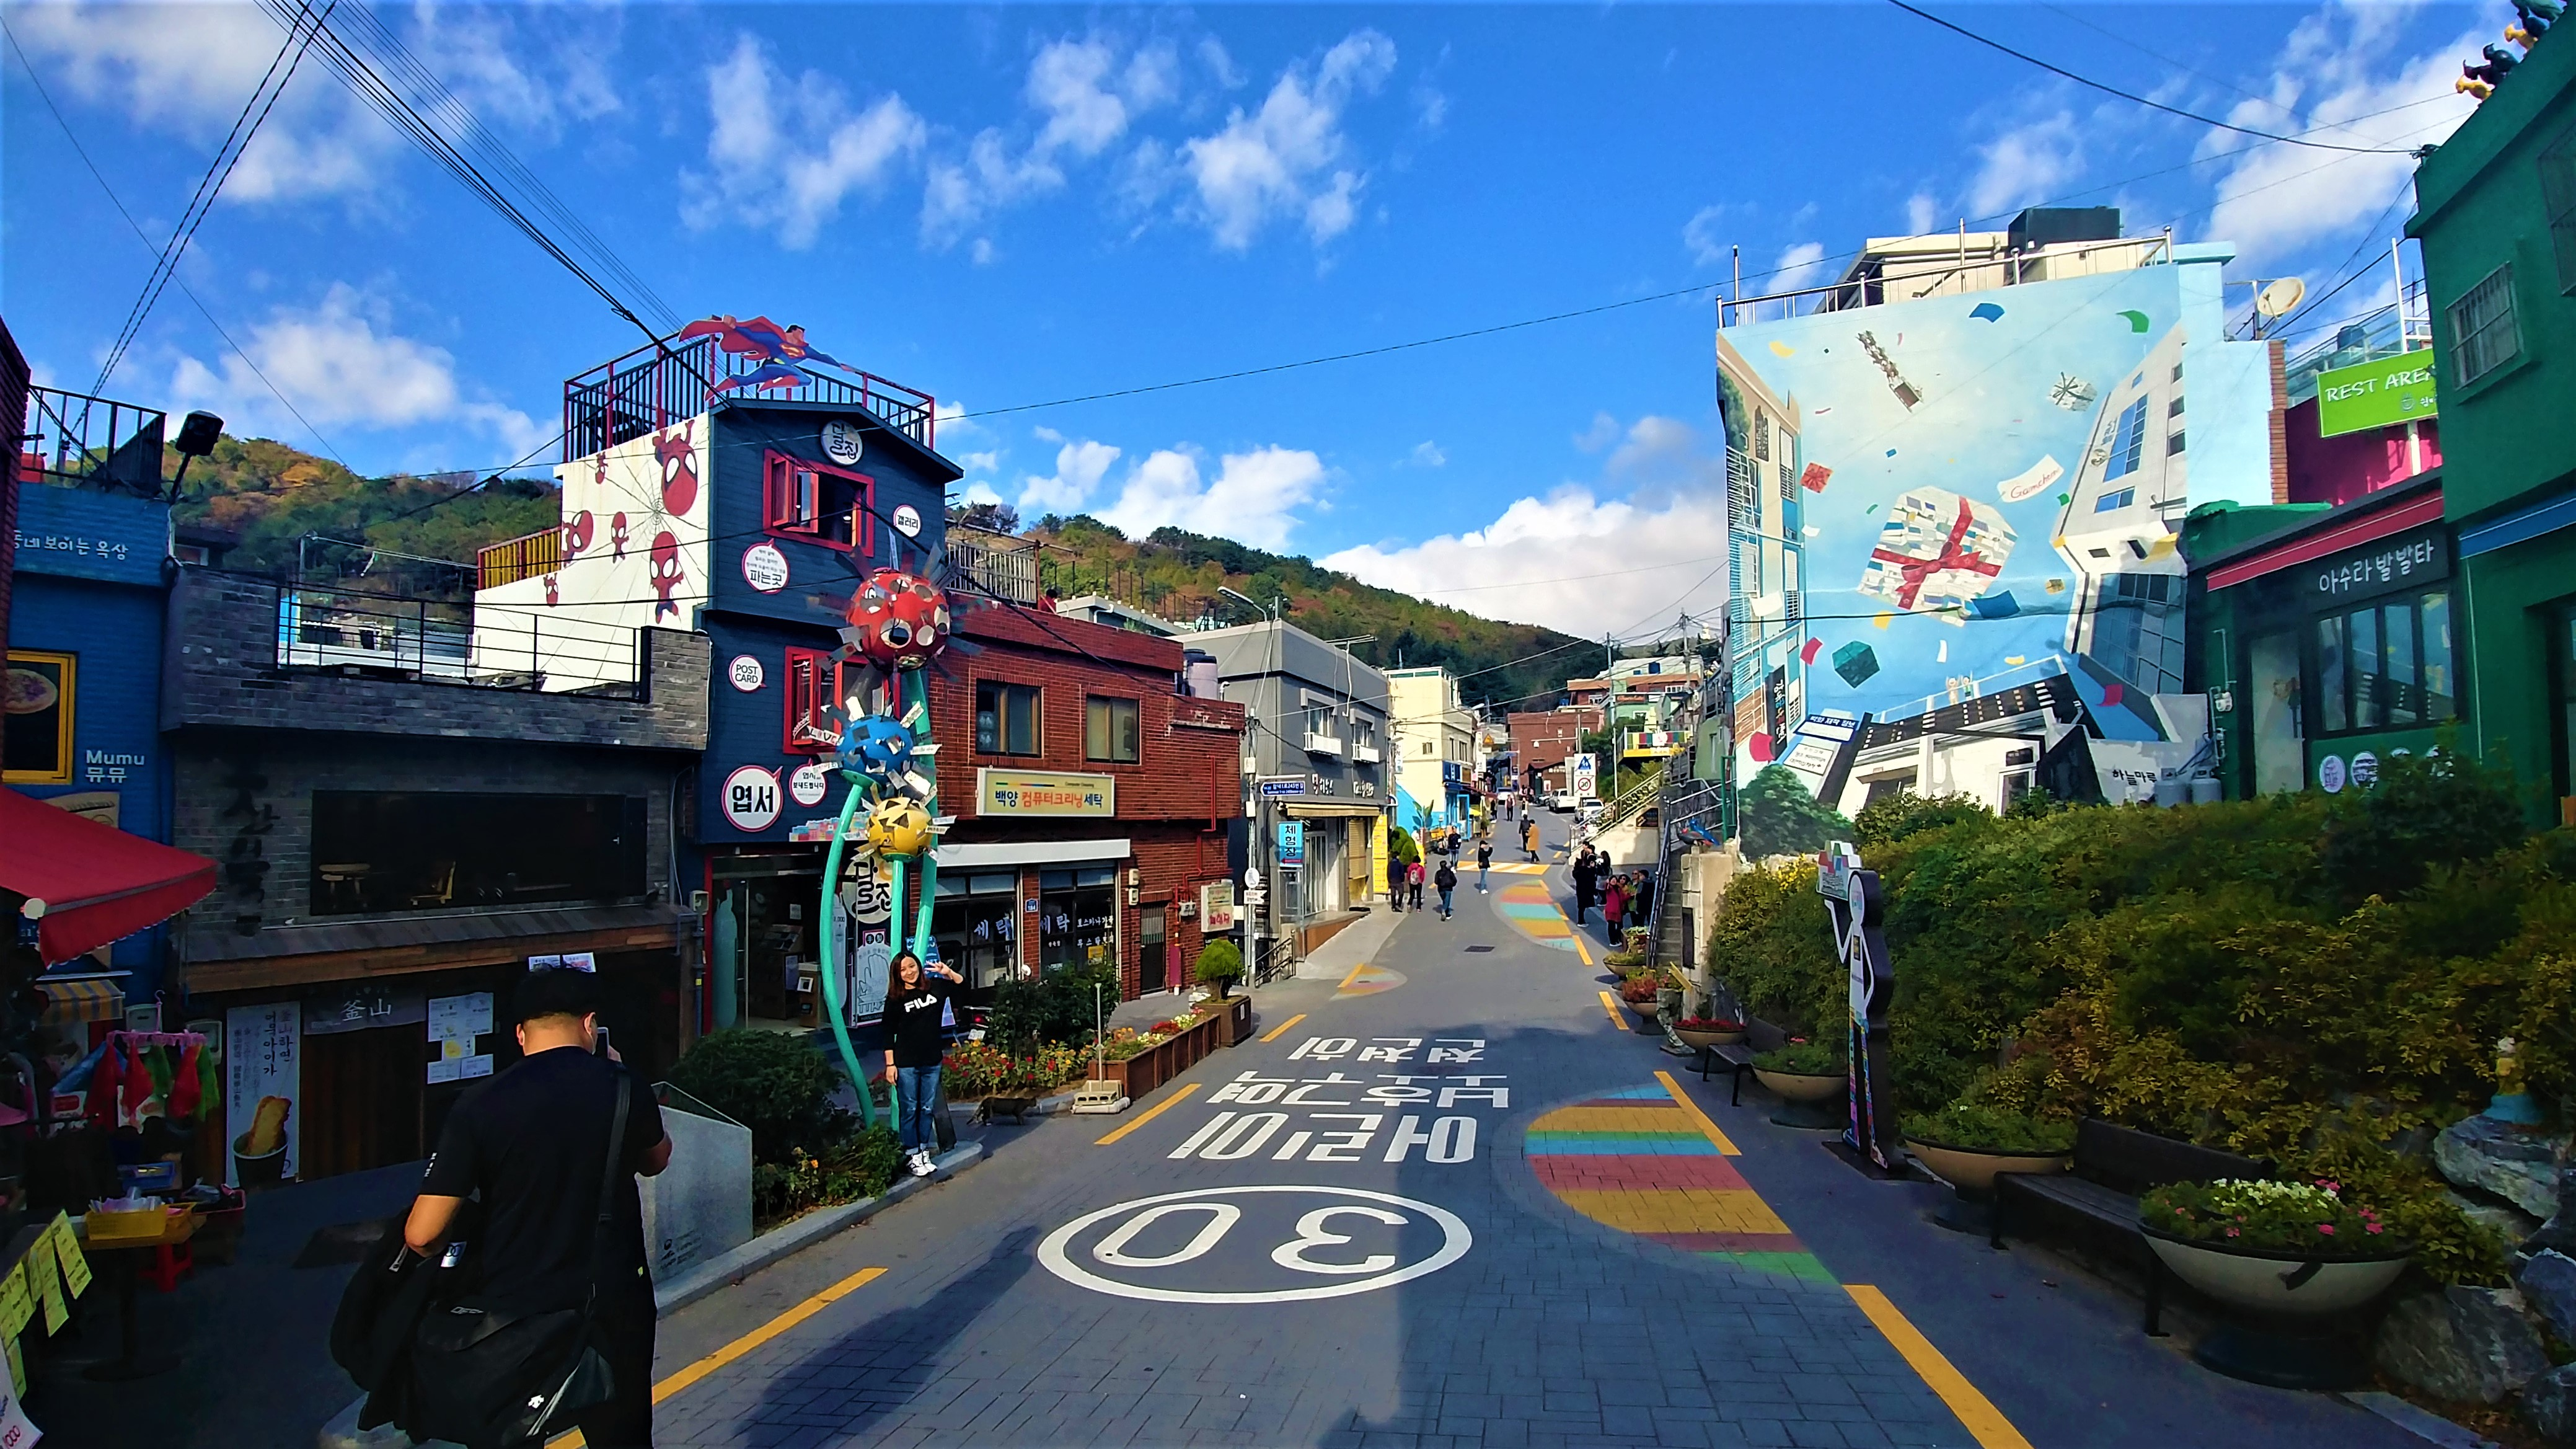 Busan street art gamcheon village que voir petit prince blog voyage asie arpenter le chemin